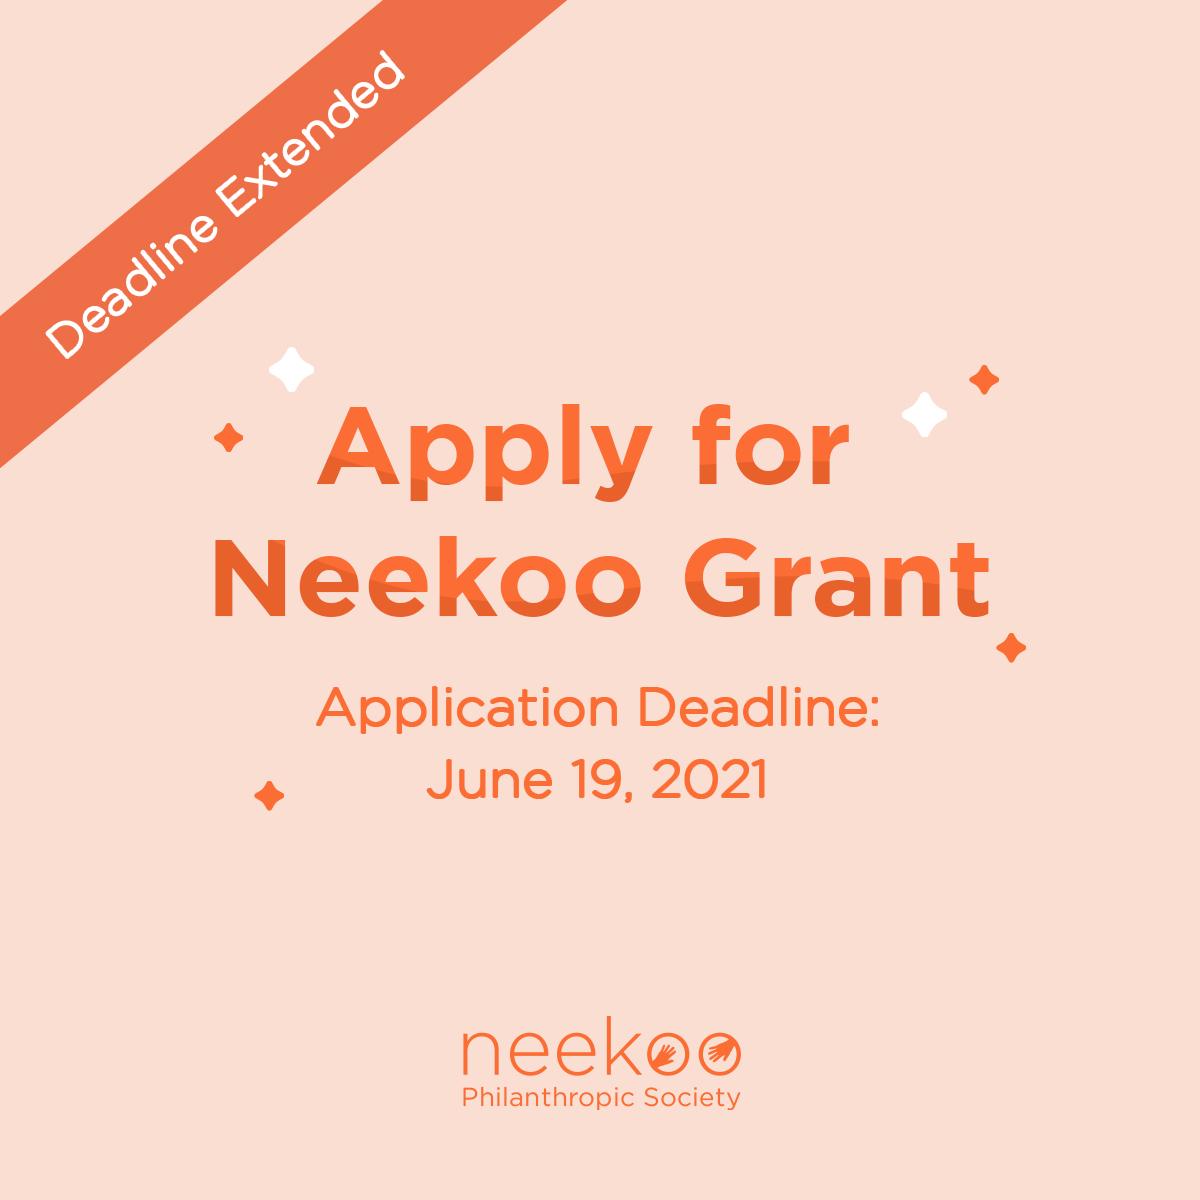 Neekoo Grant Application